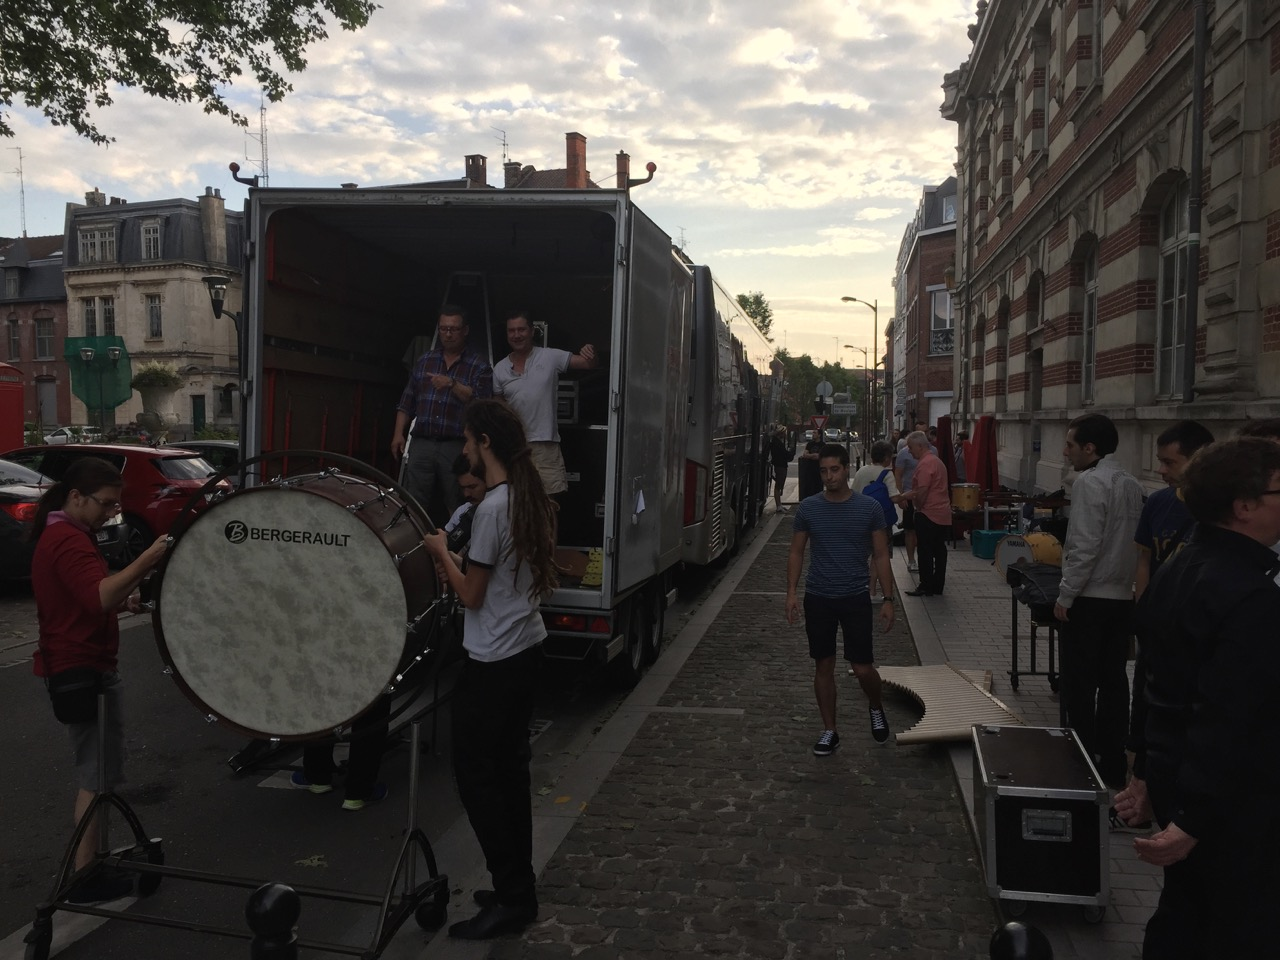 2018-05-ConcertChalonsEnChampagne - 3